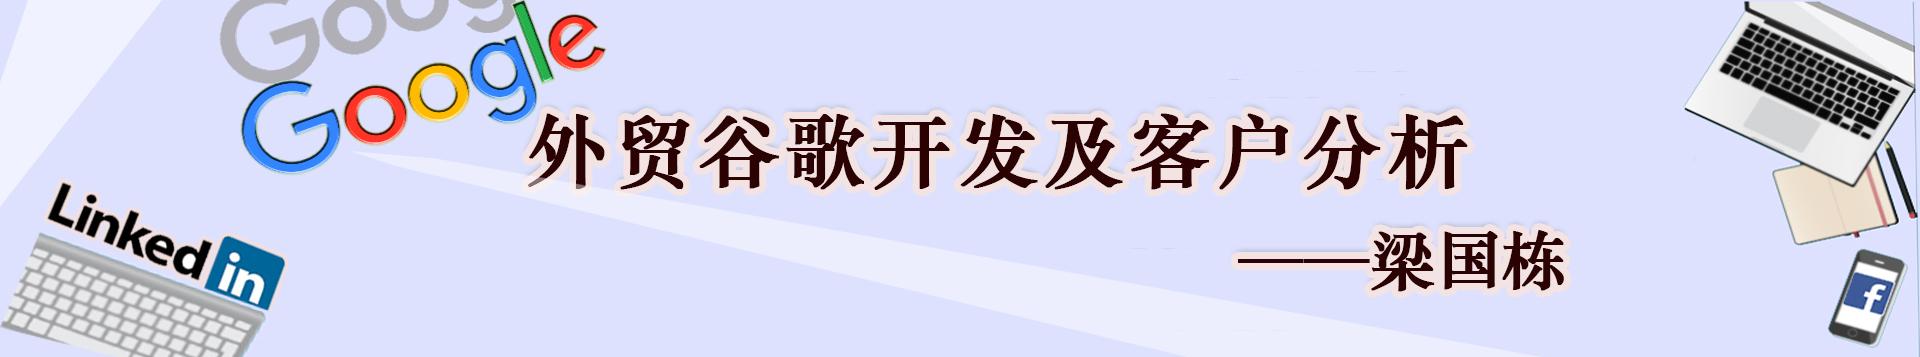 梁老师课程banner 首页